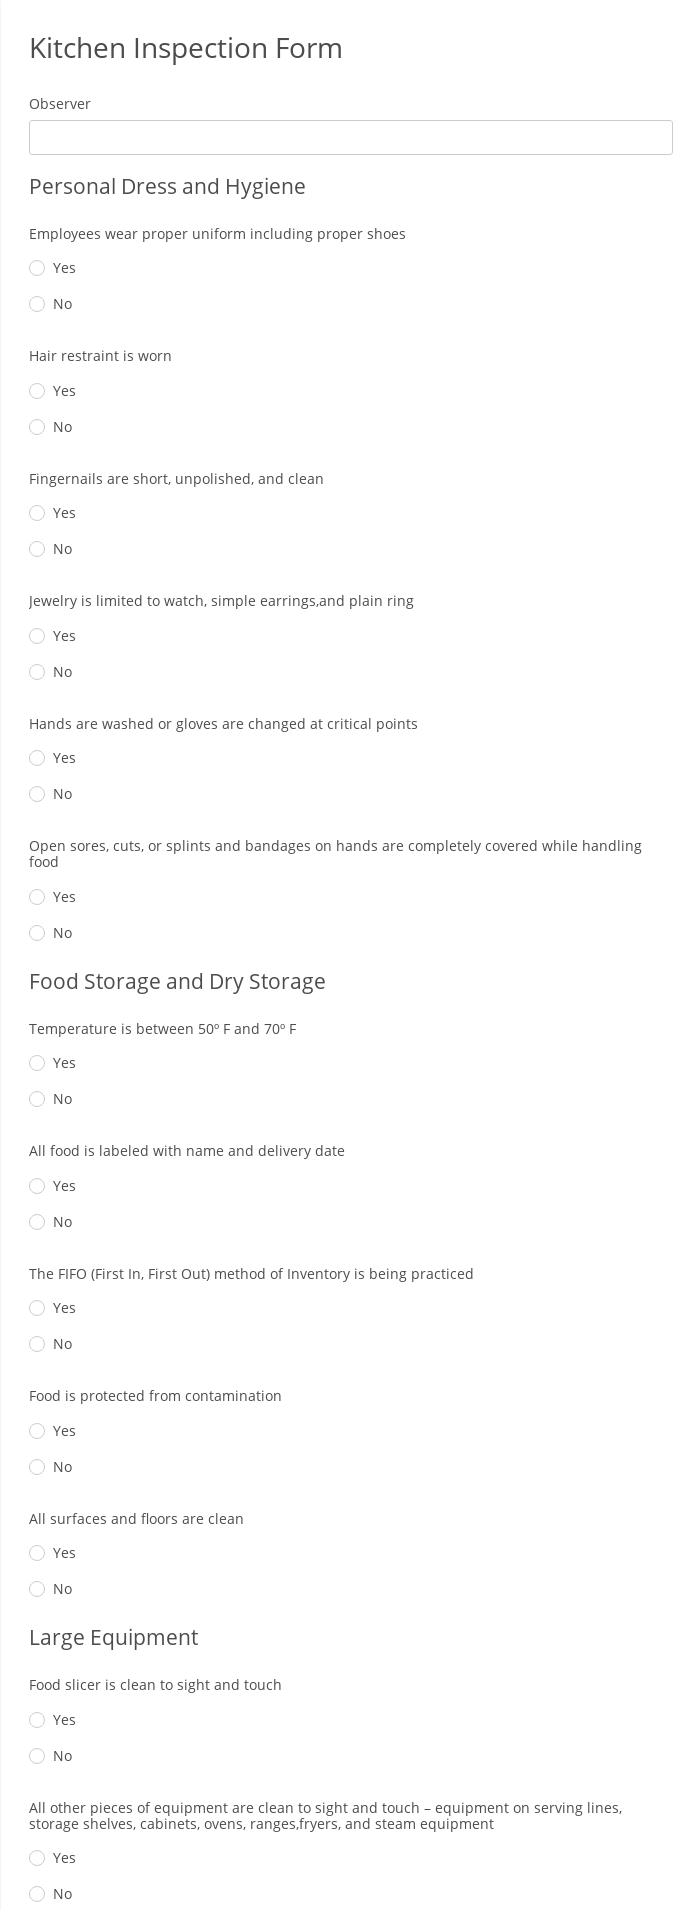 Kitchen Inspection Form